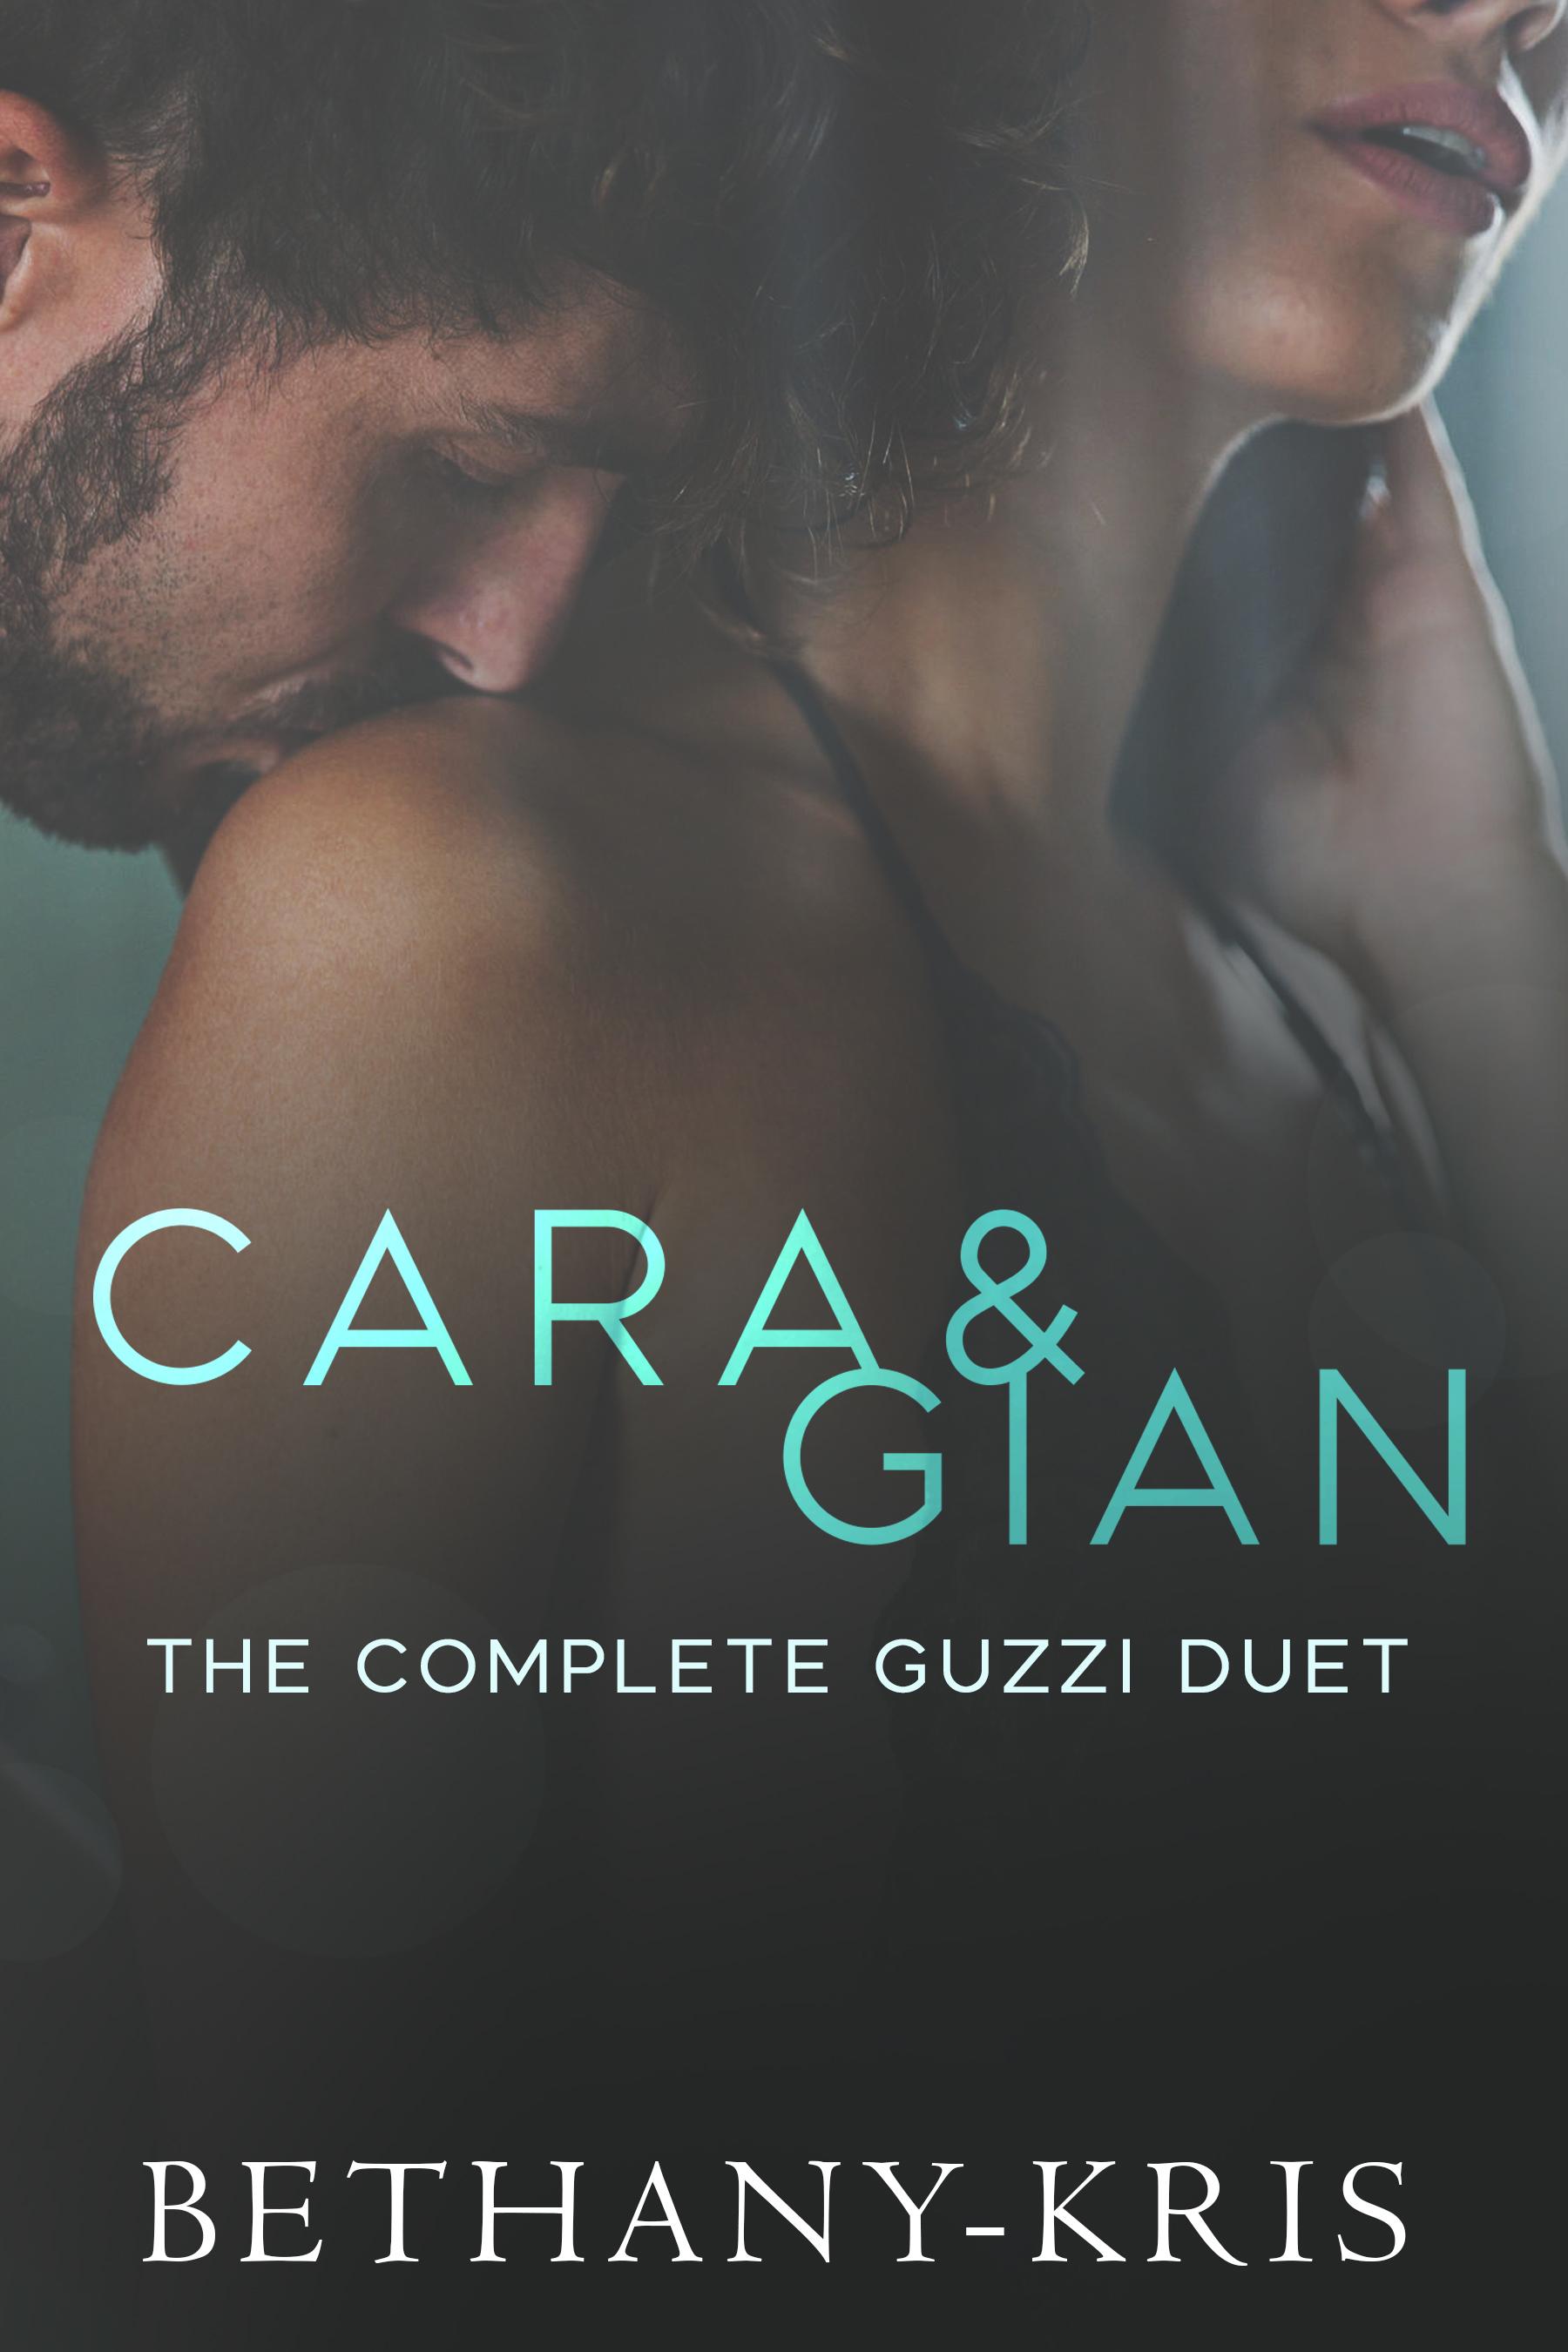 Bethany-Kris - Cara & Gian The Complete Guzzi Duet